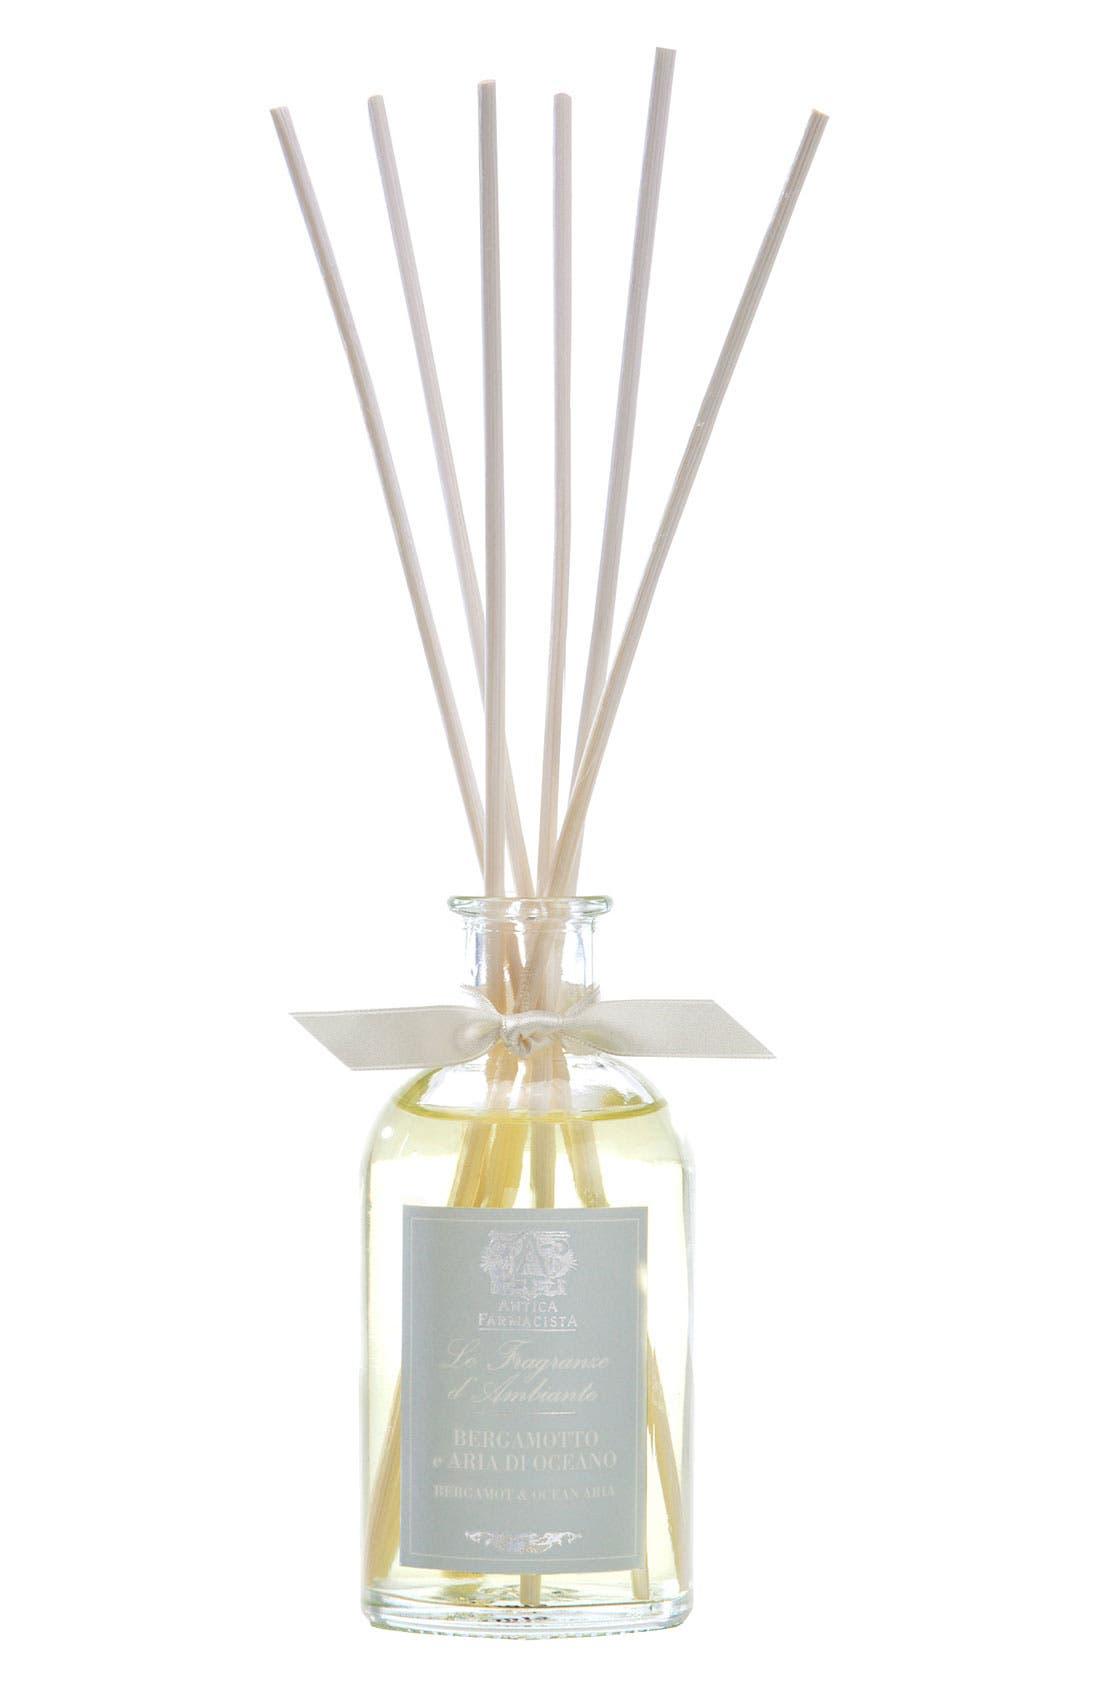 Antica Farmacista Bergamot & Ocean Aria Home Ambiance Perfume (3.3 oz.)